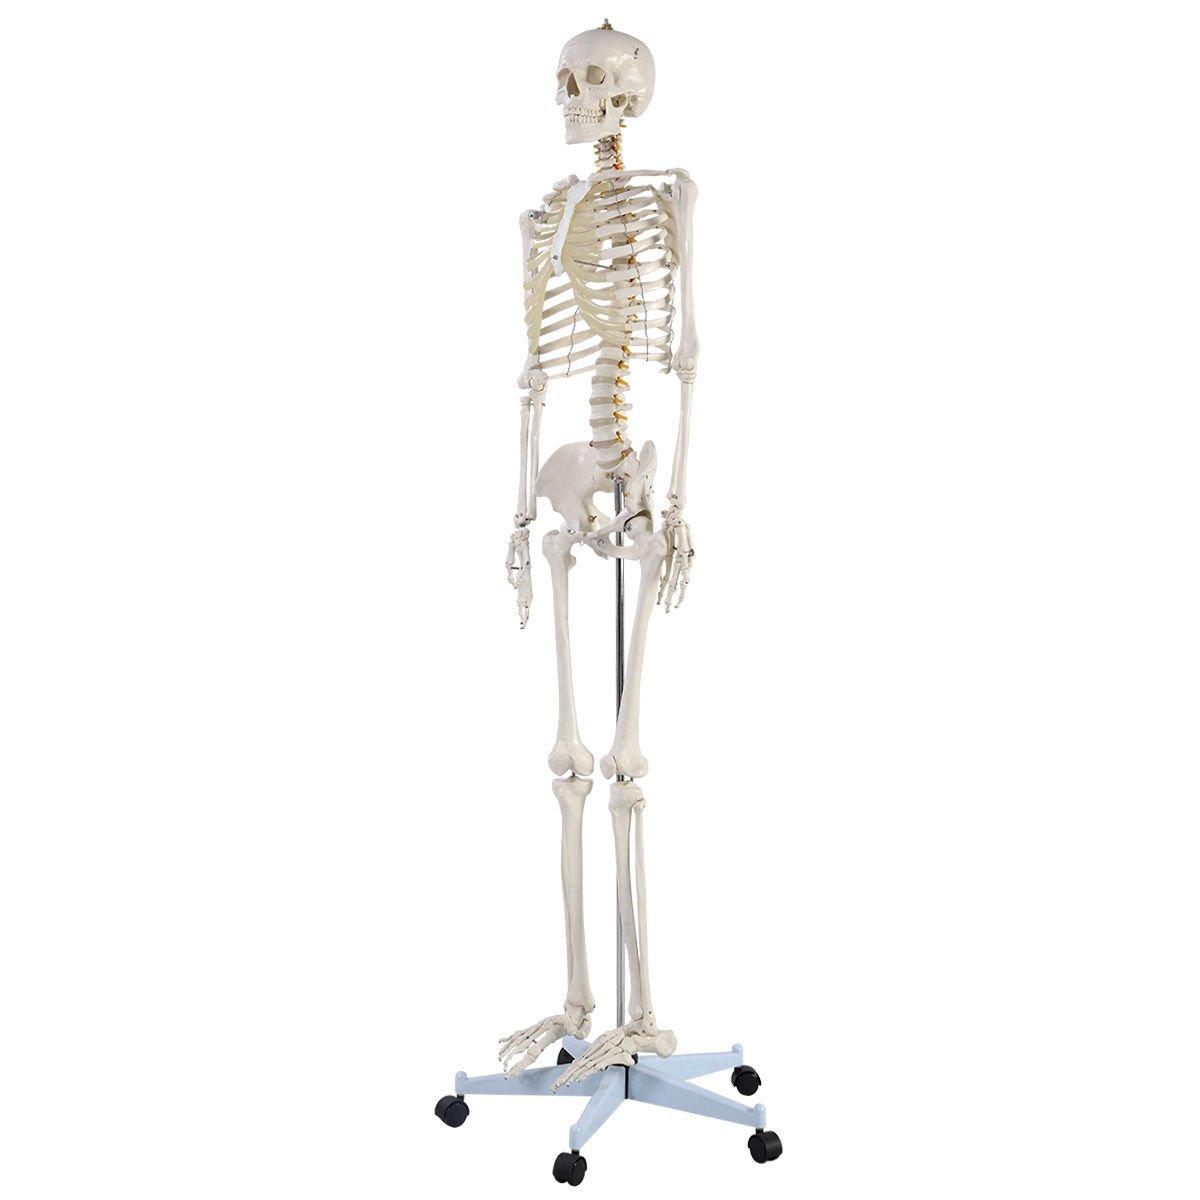 Amazon.com: Giantex Life Size Human Anatomical Anatomy Skeleton ...